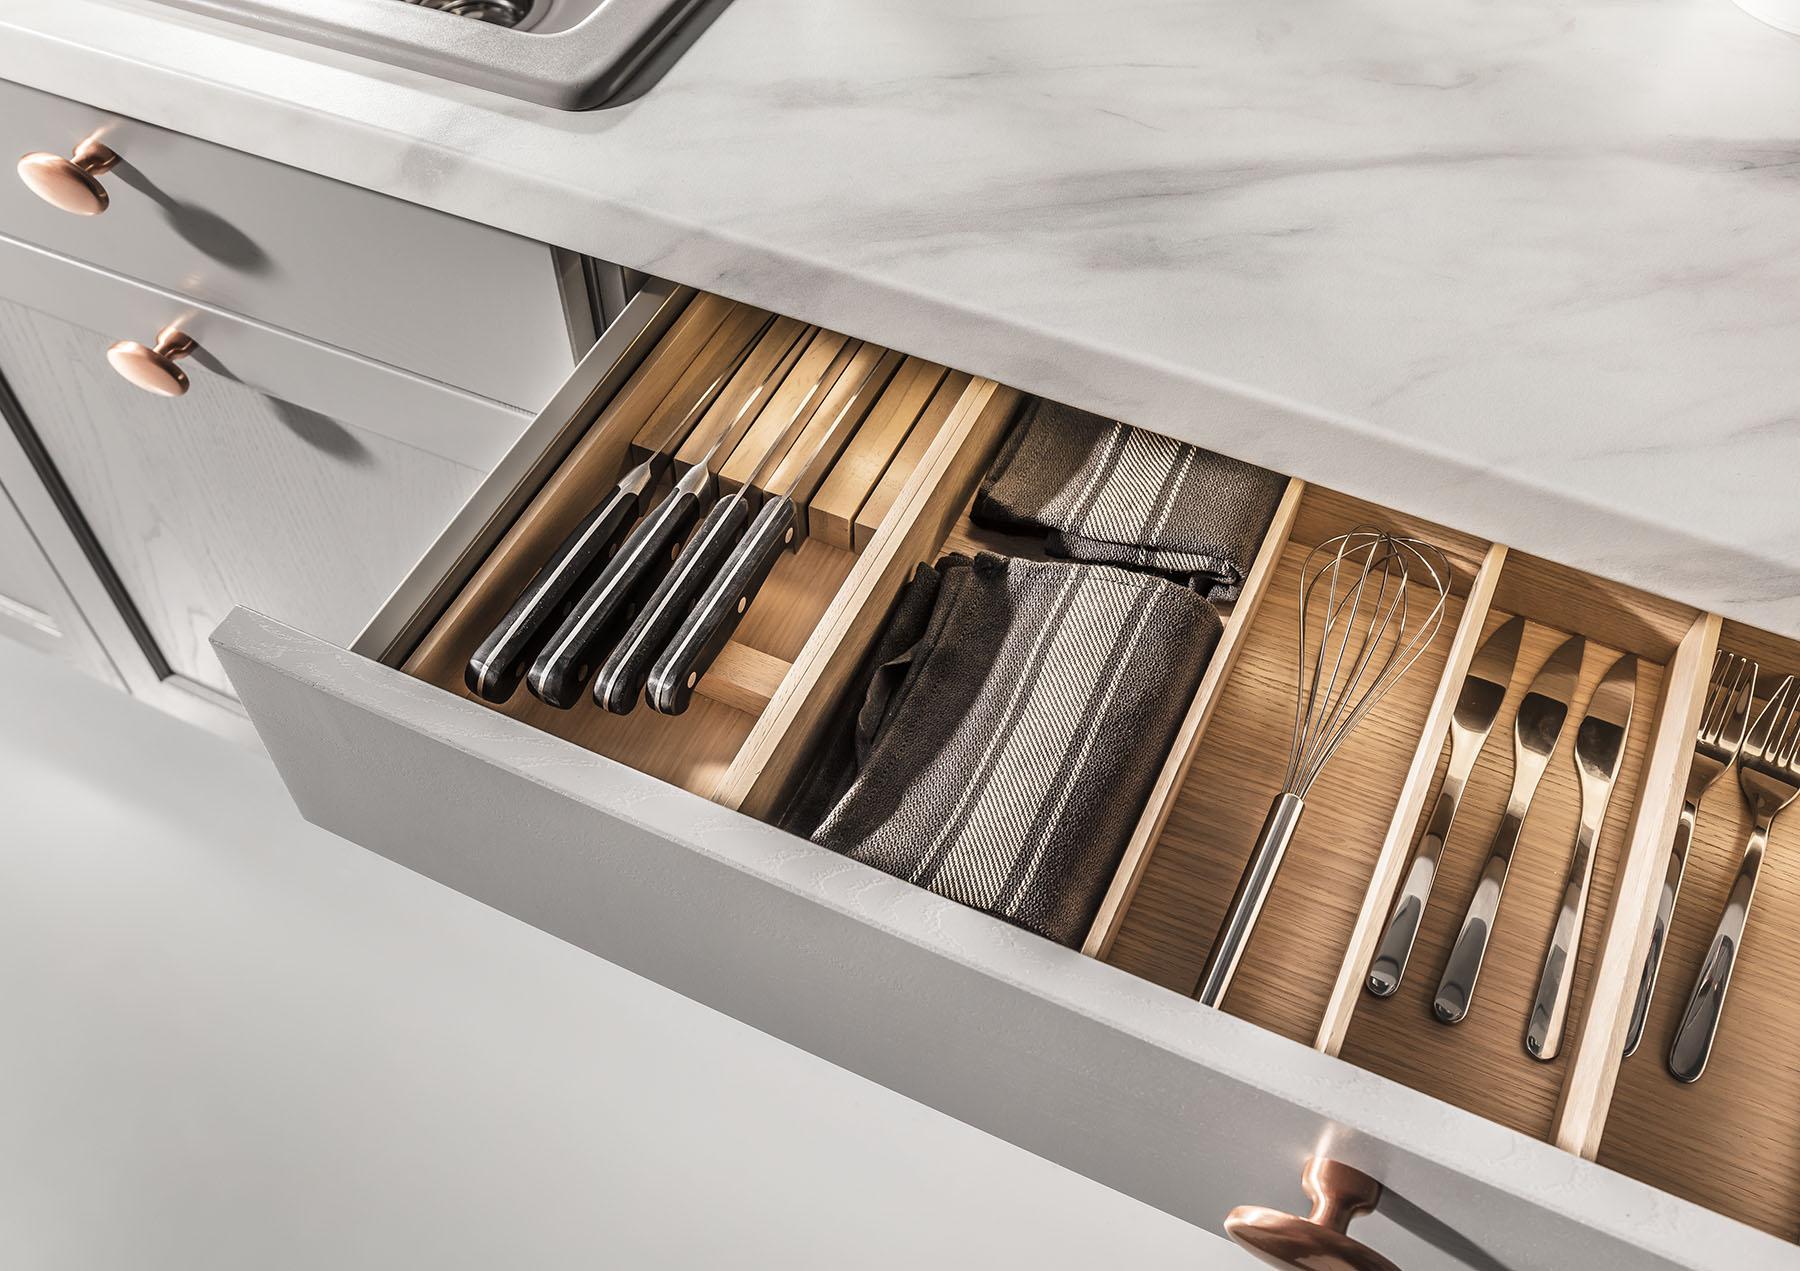 Meble kuchenne Bristol- oferta na kuchnie firmy SAS Wnętrza i Kuchnie